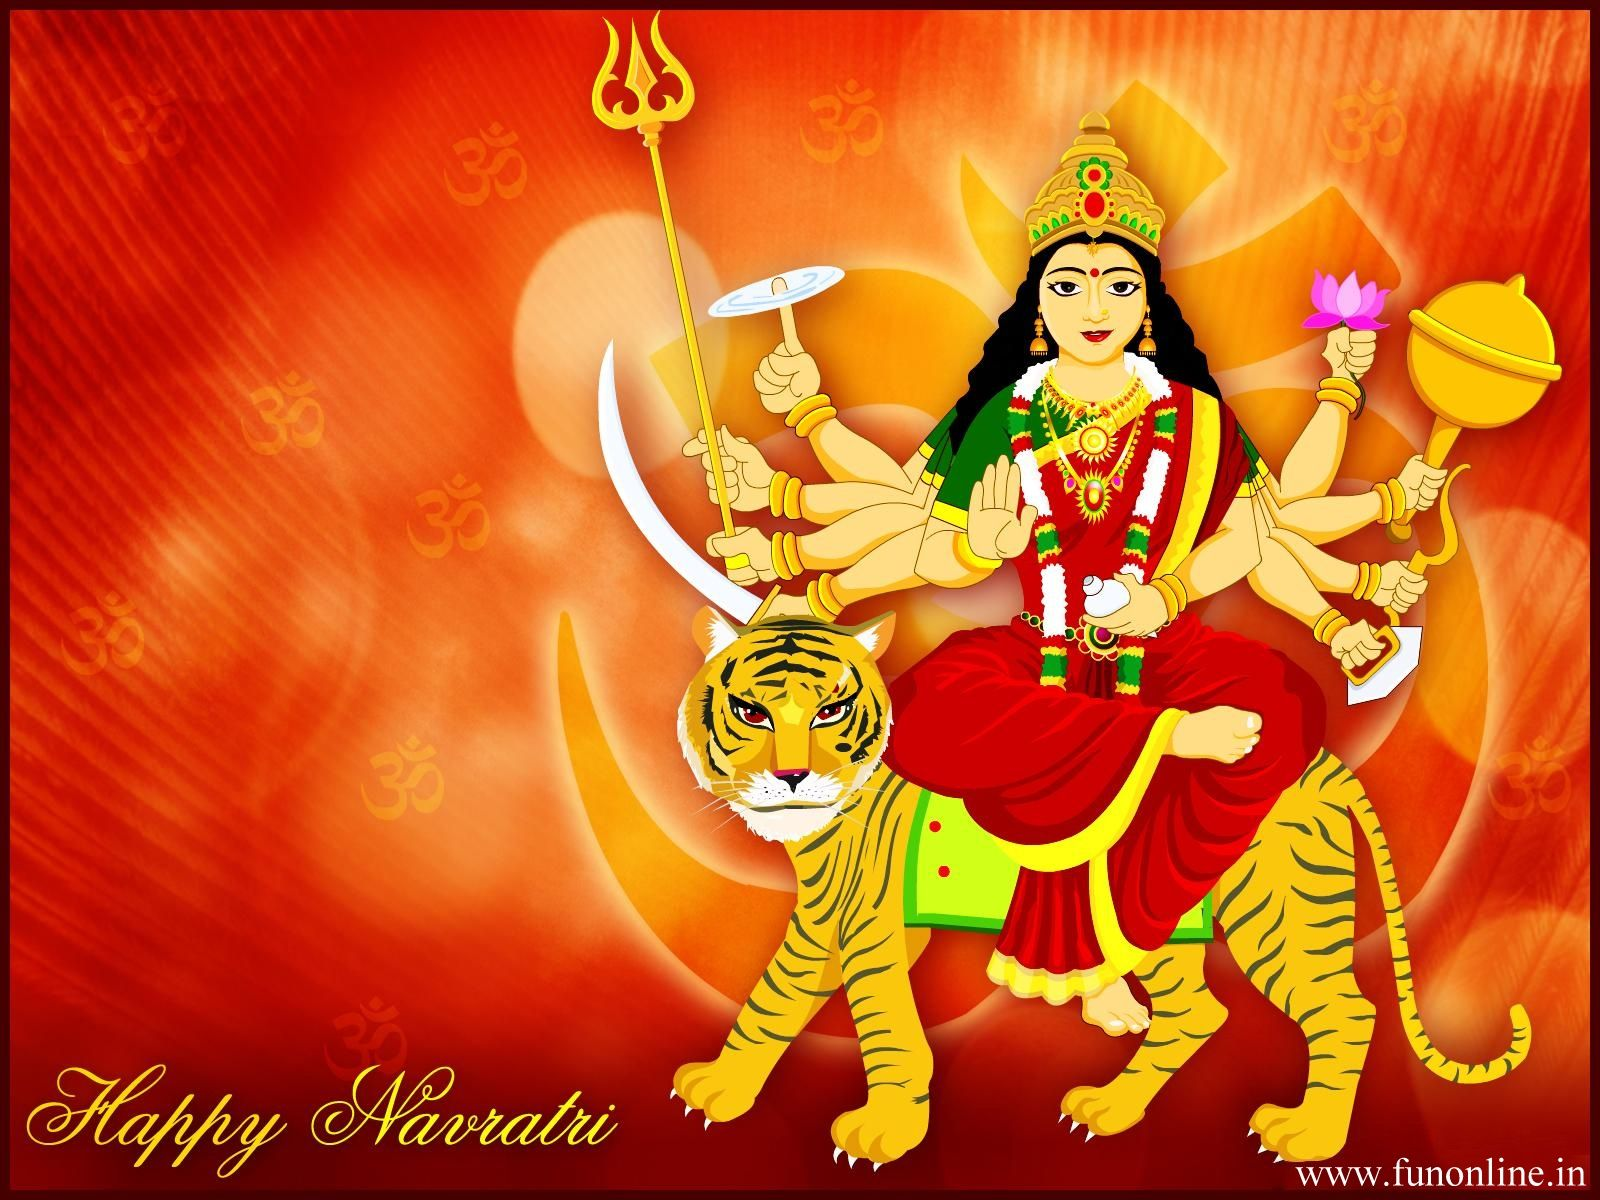 Happy Navratri Animated Iscblog Happy Navratri Navratri Images Durga Puja